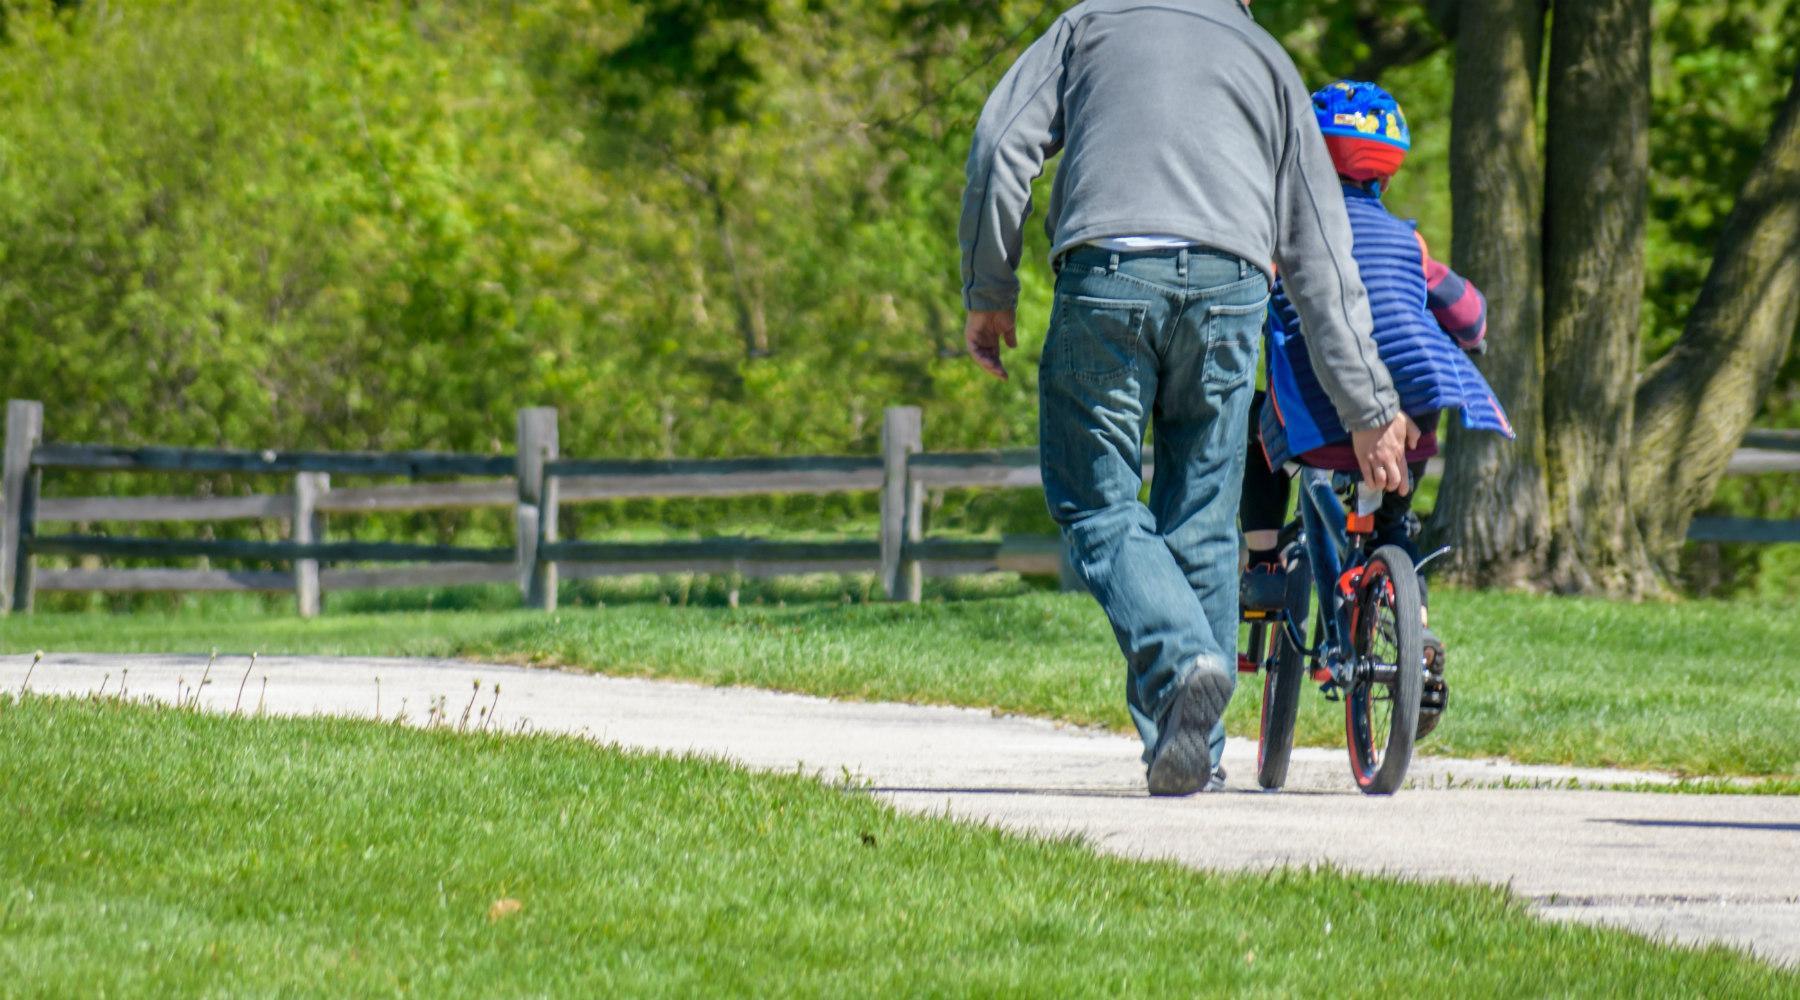 Man teaching little boy how to ride a bike